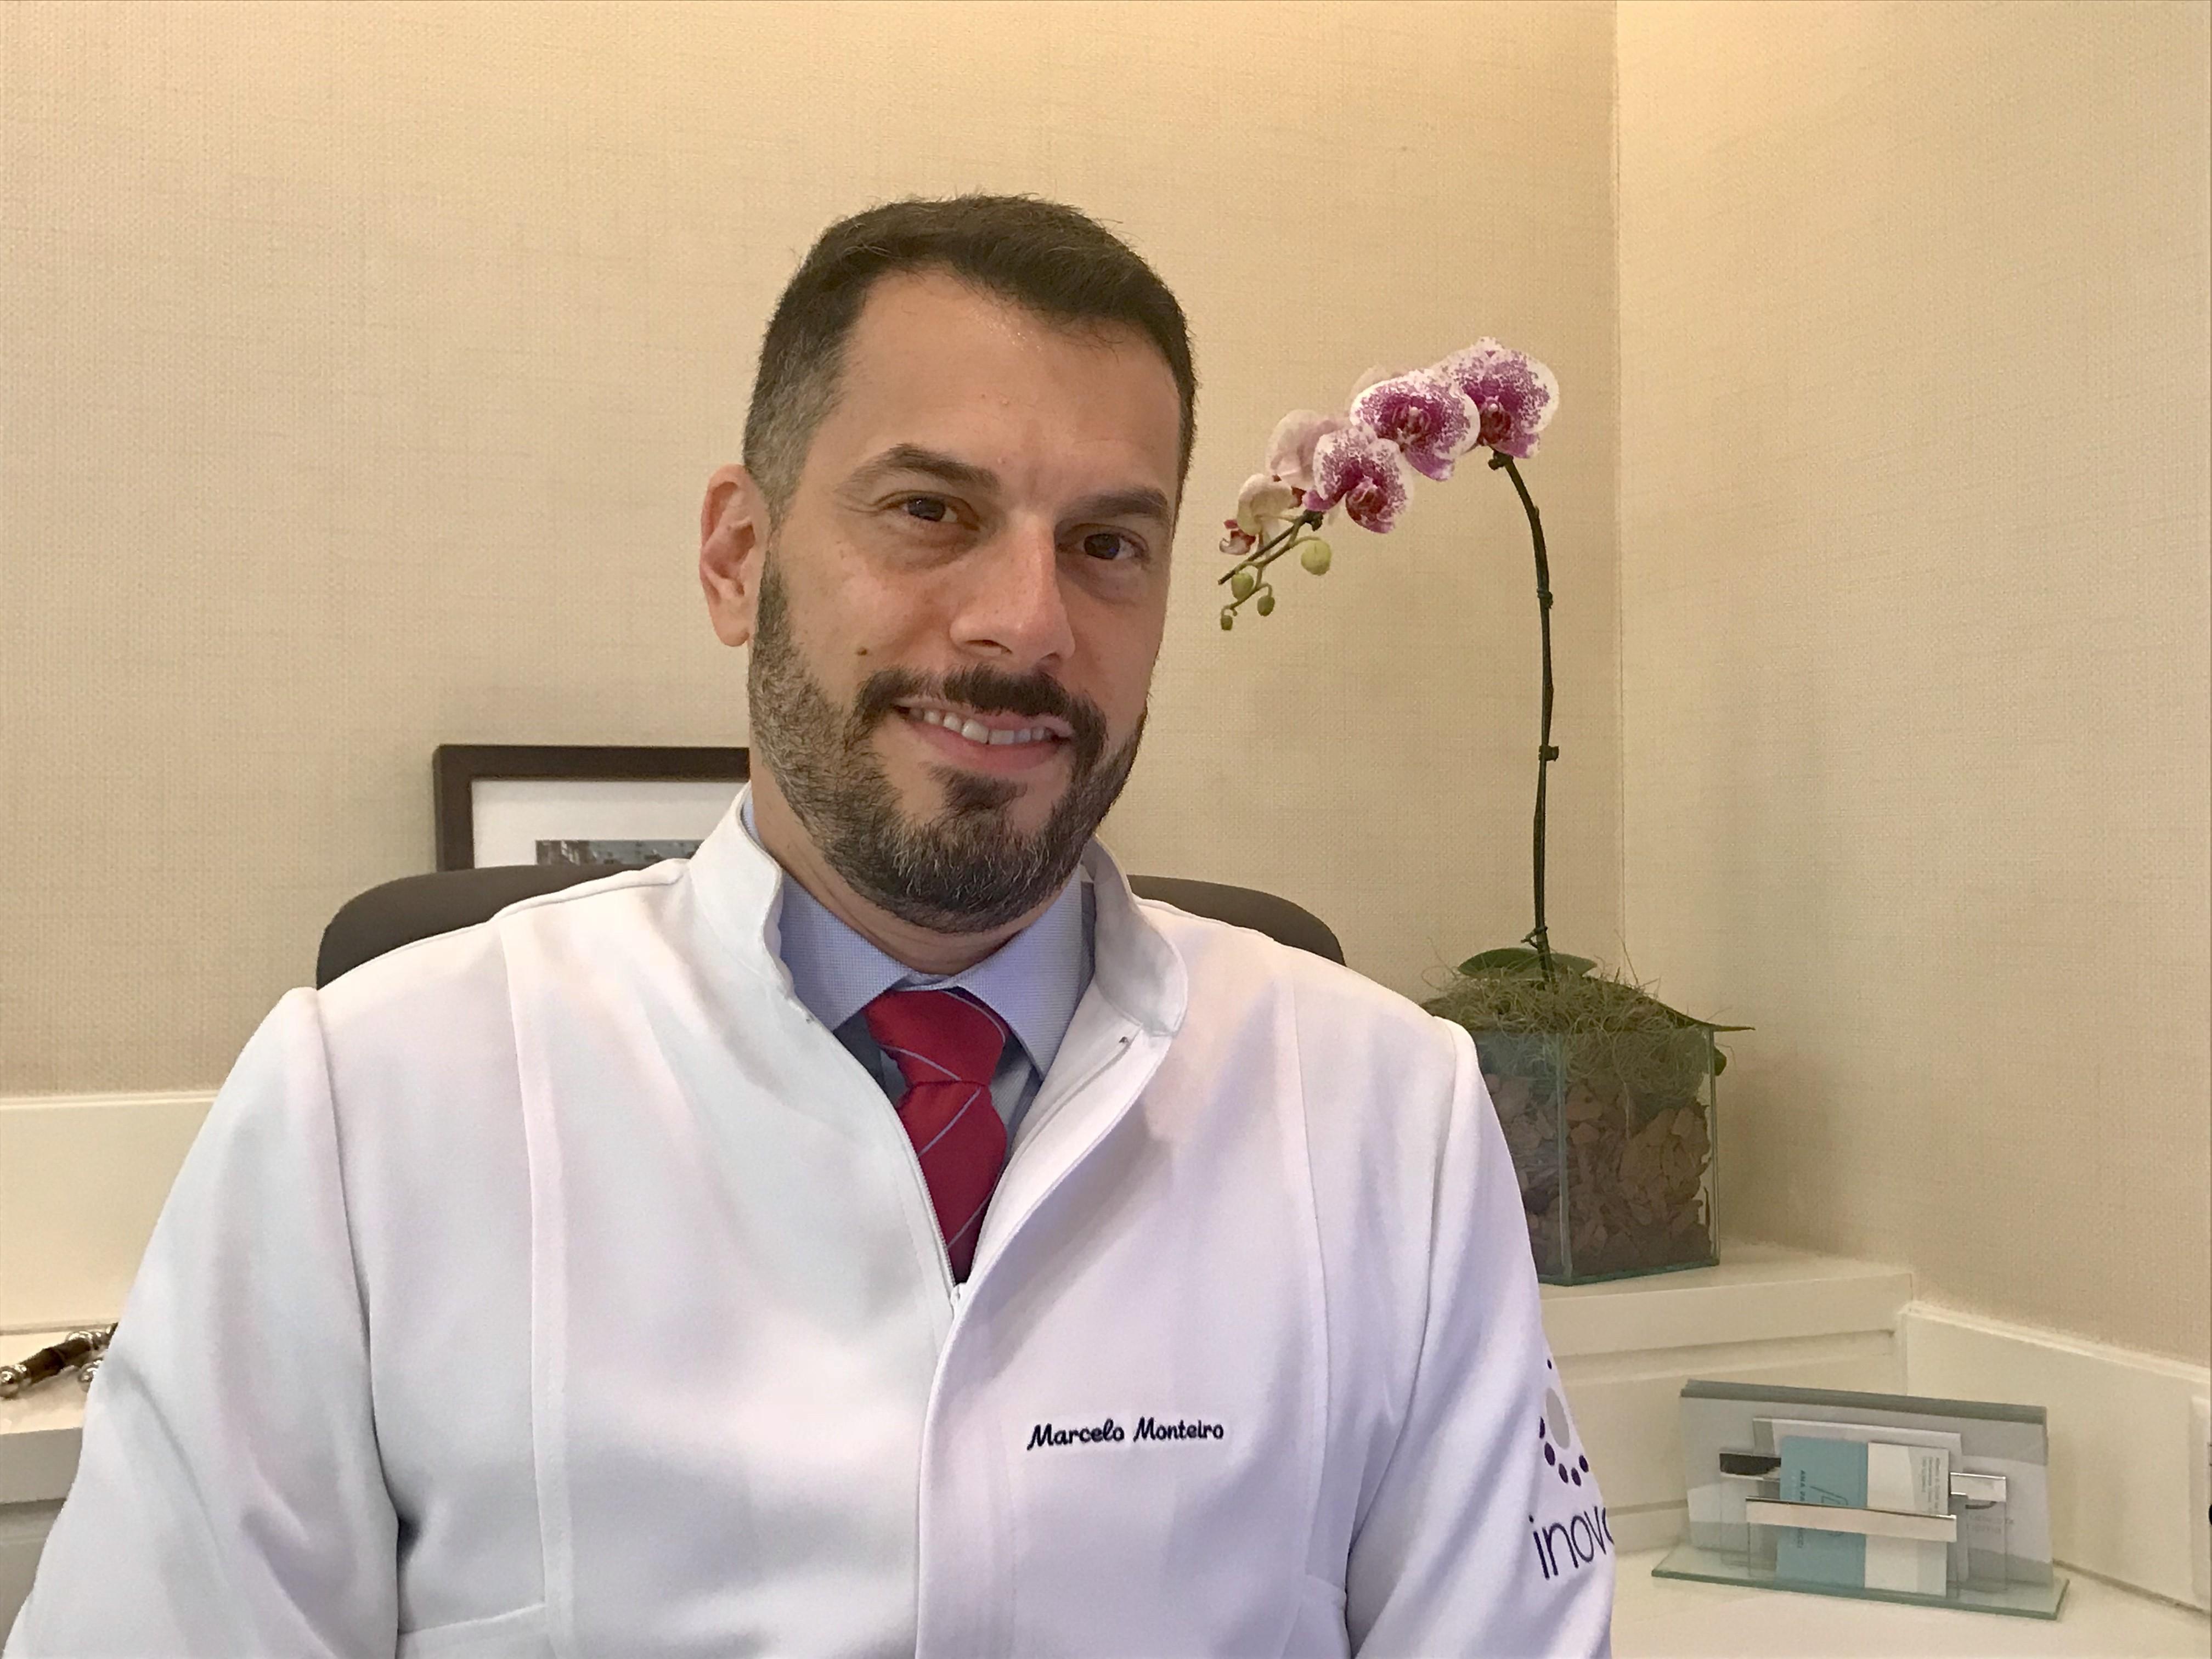 Angiologistamarcelomonteiro